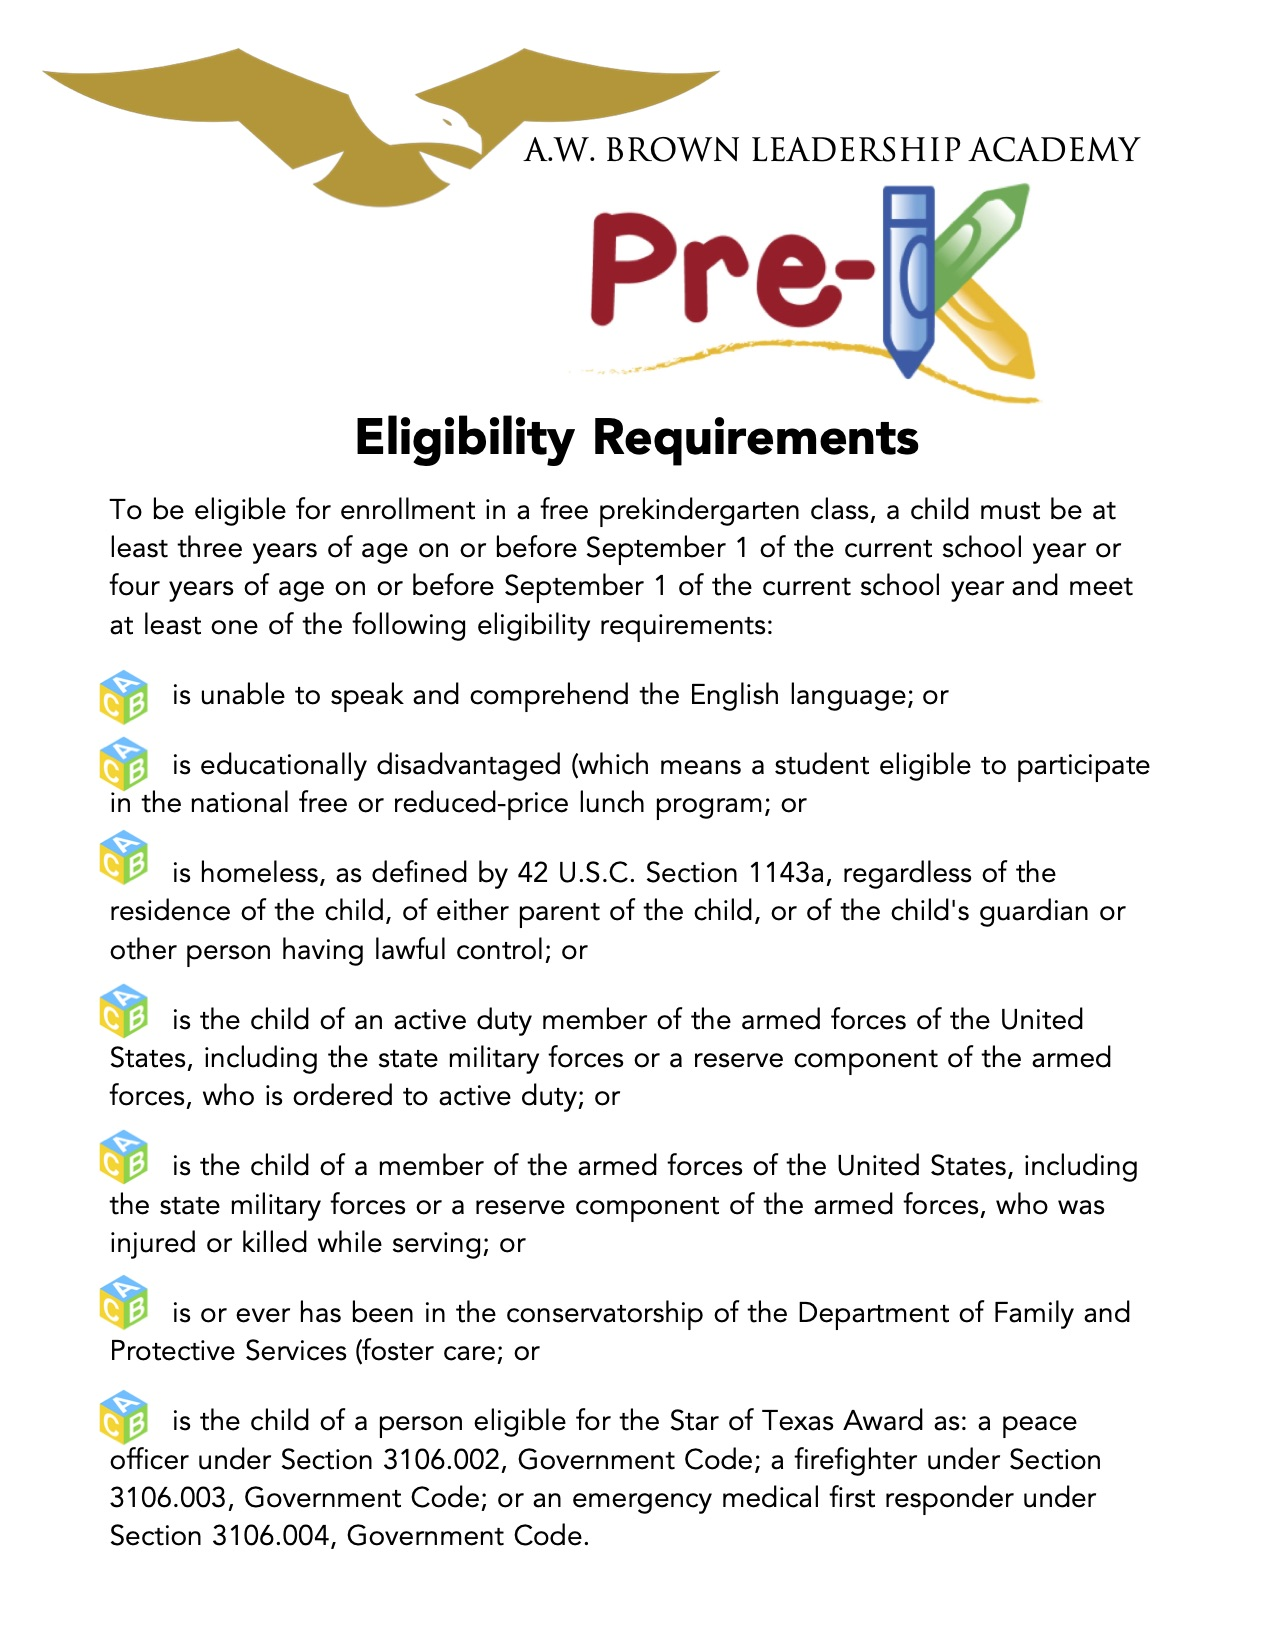 PreK Eligibility Requirements